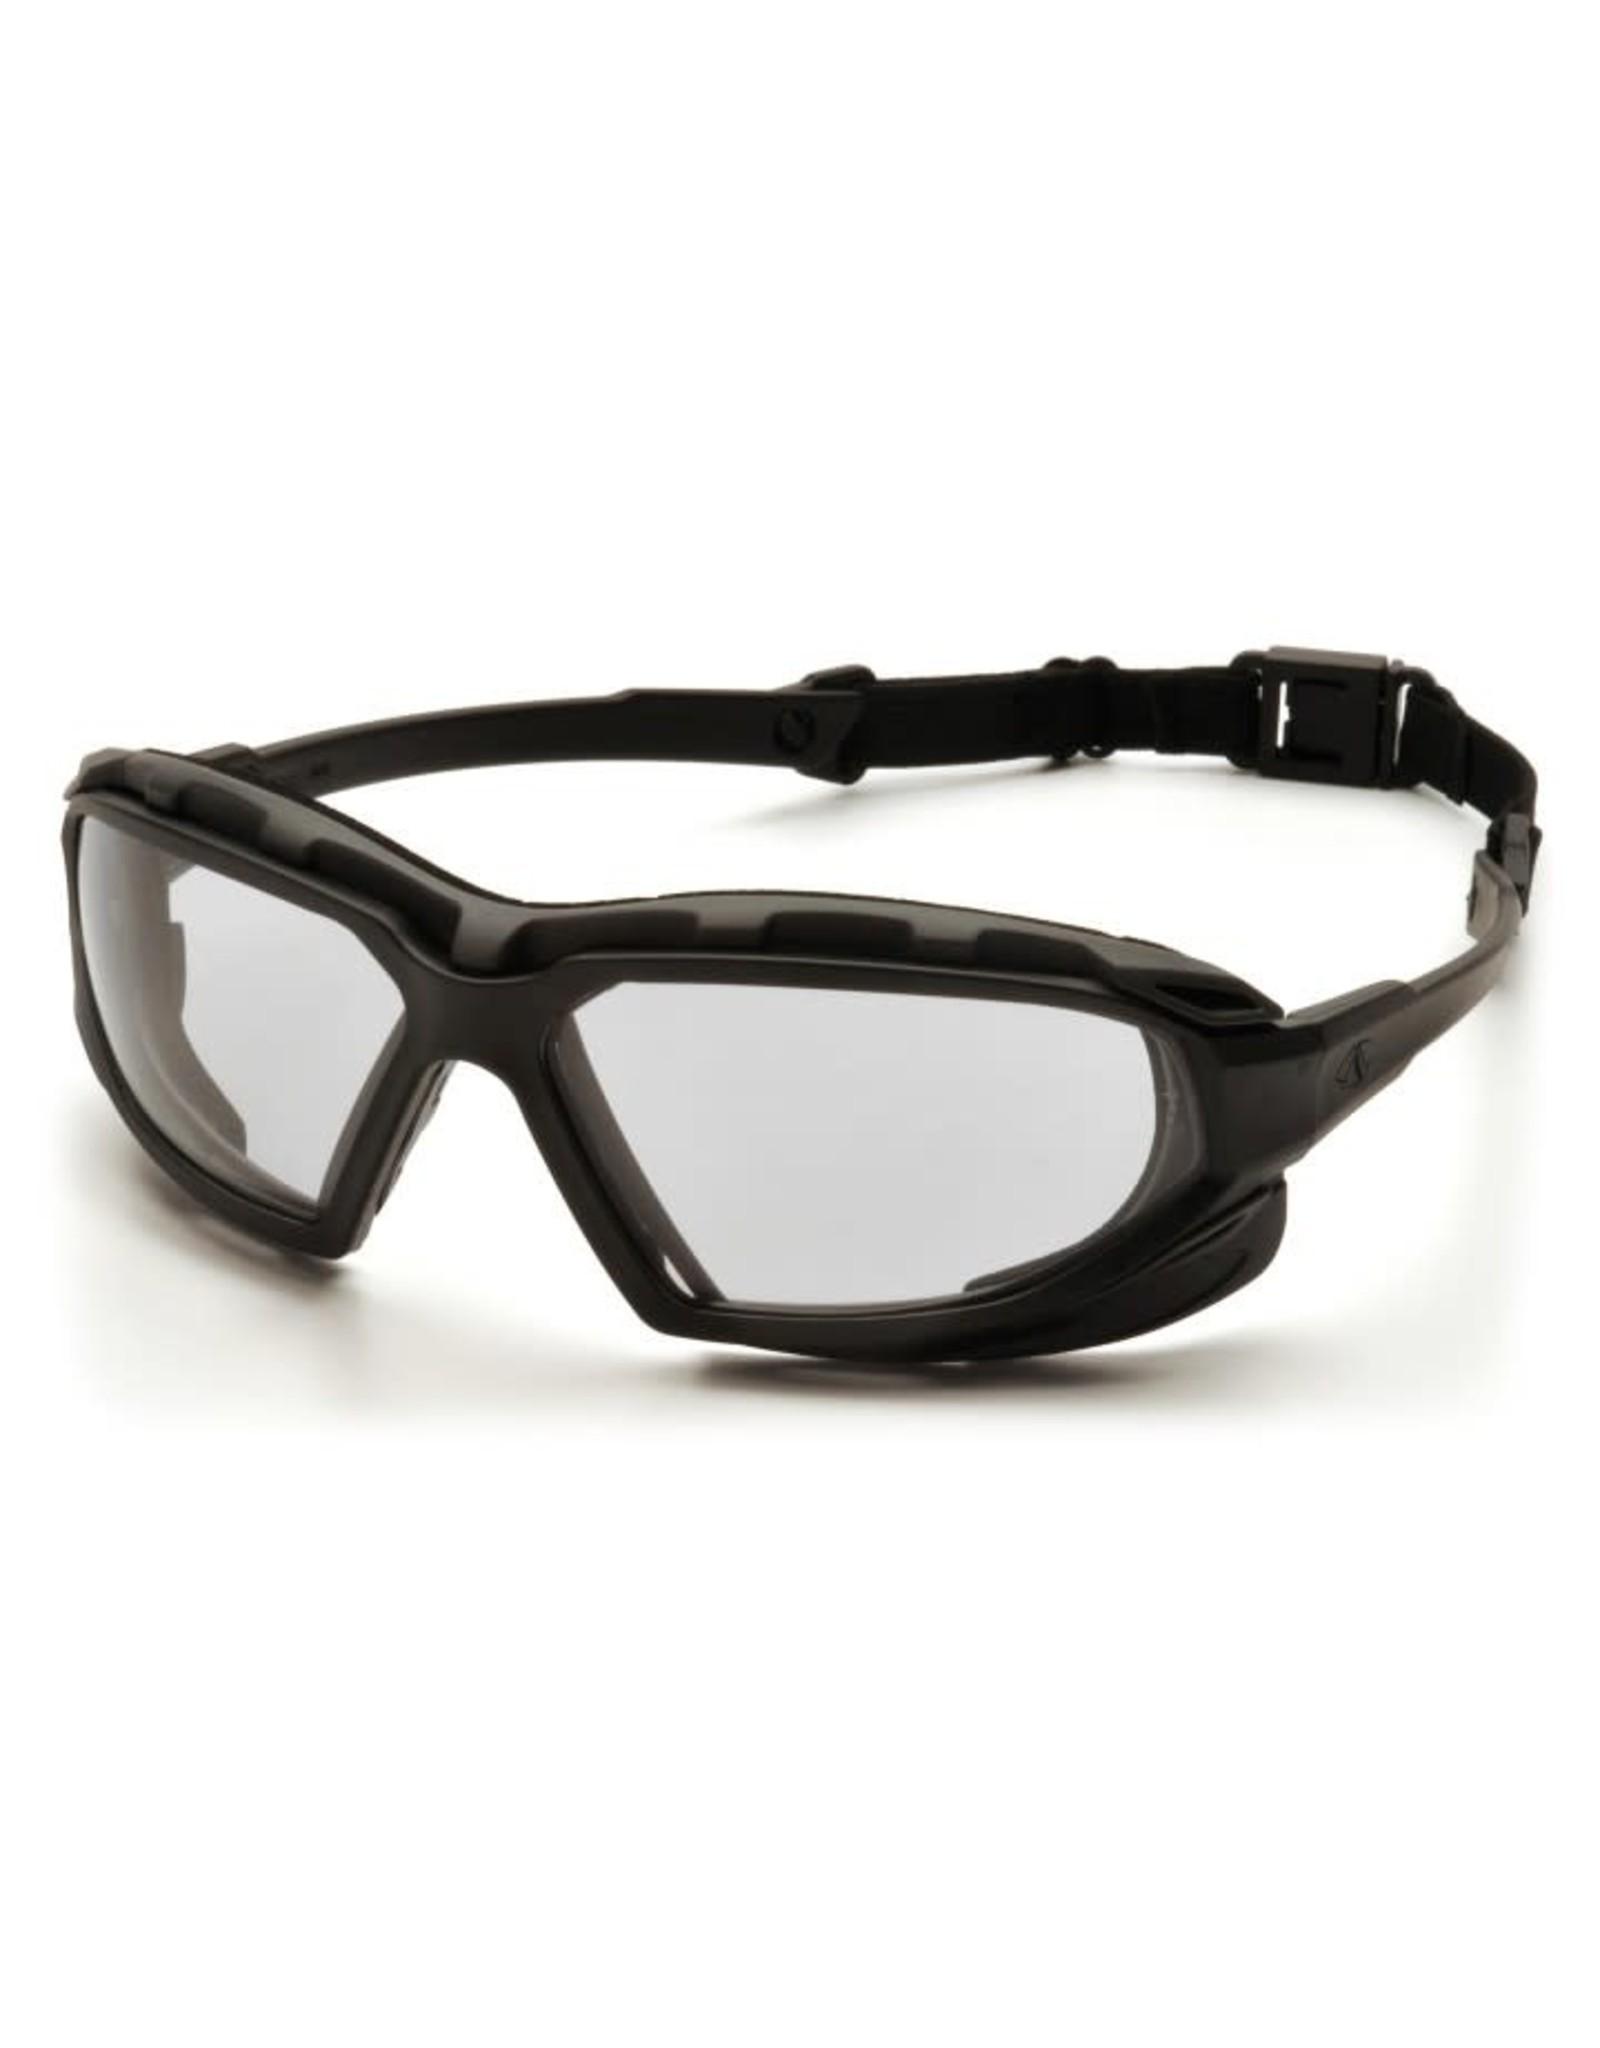 Highlander Plus Glasses